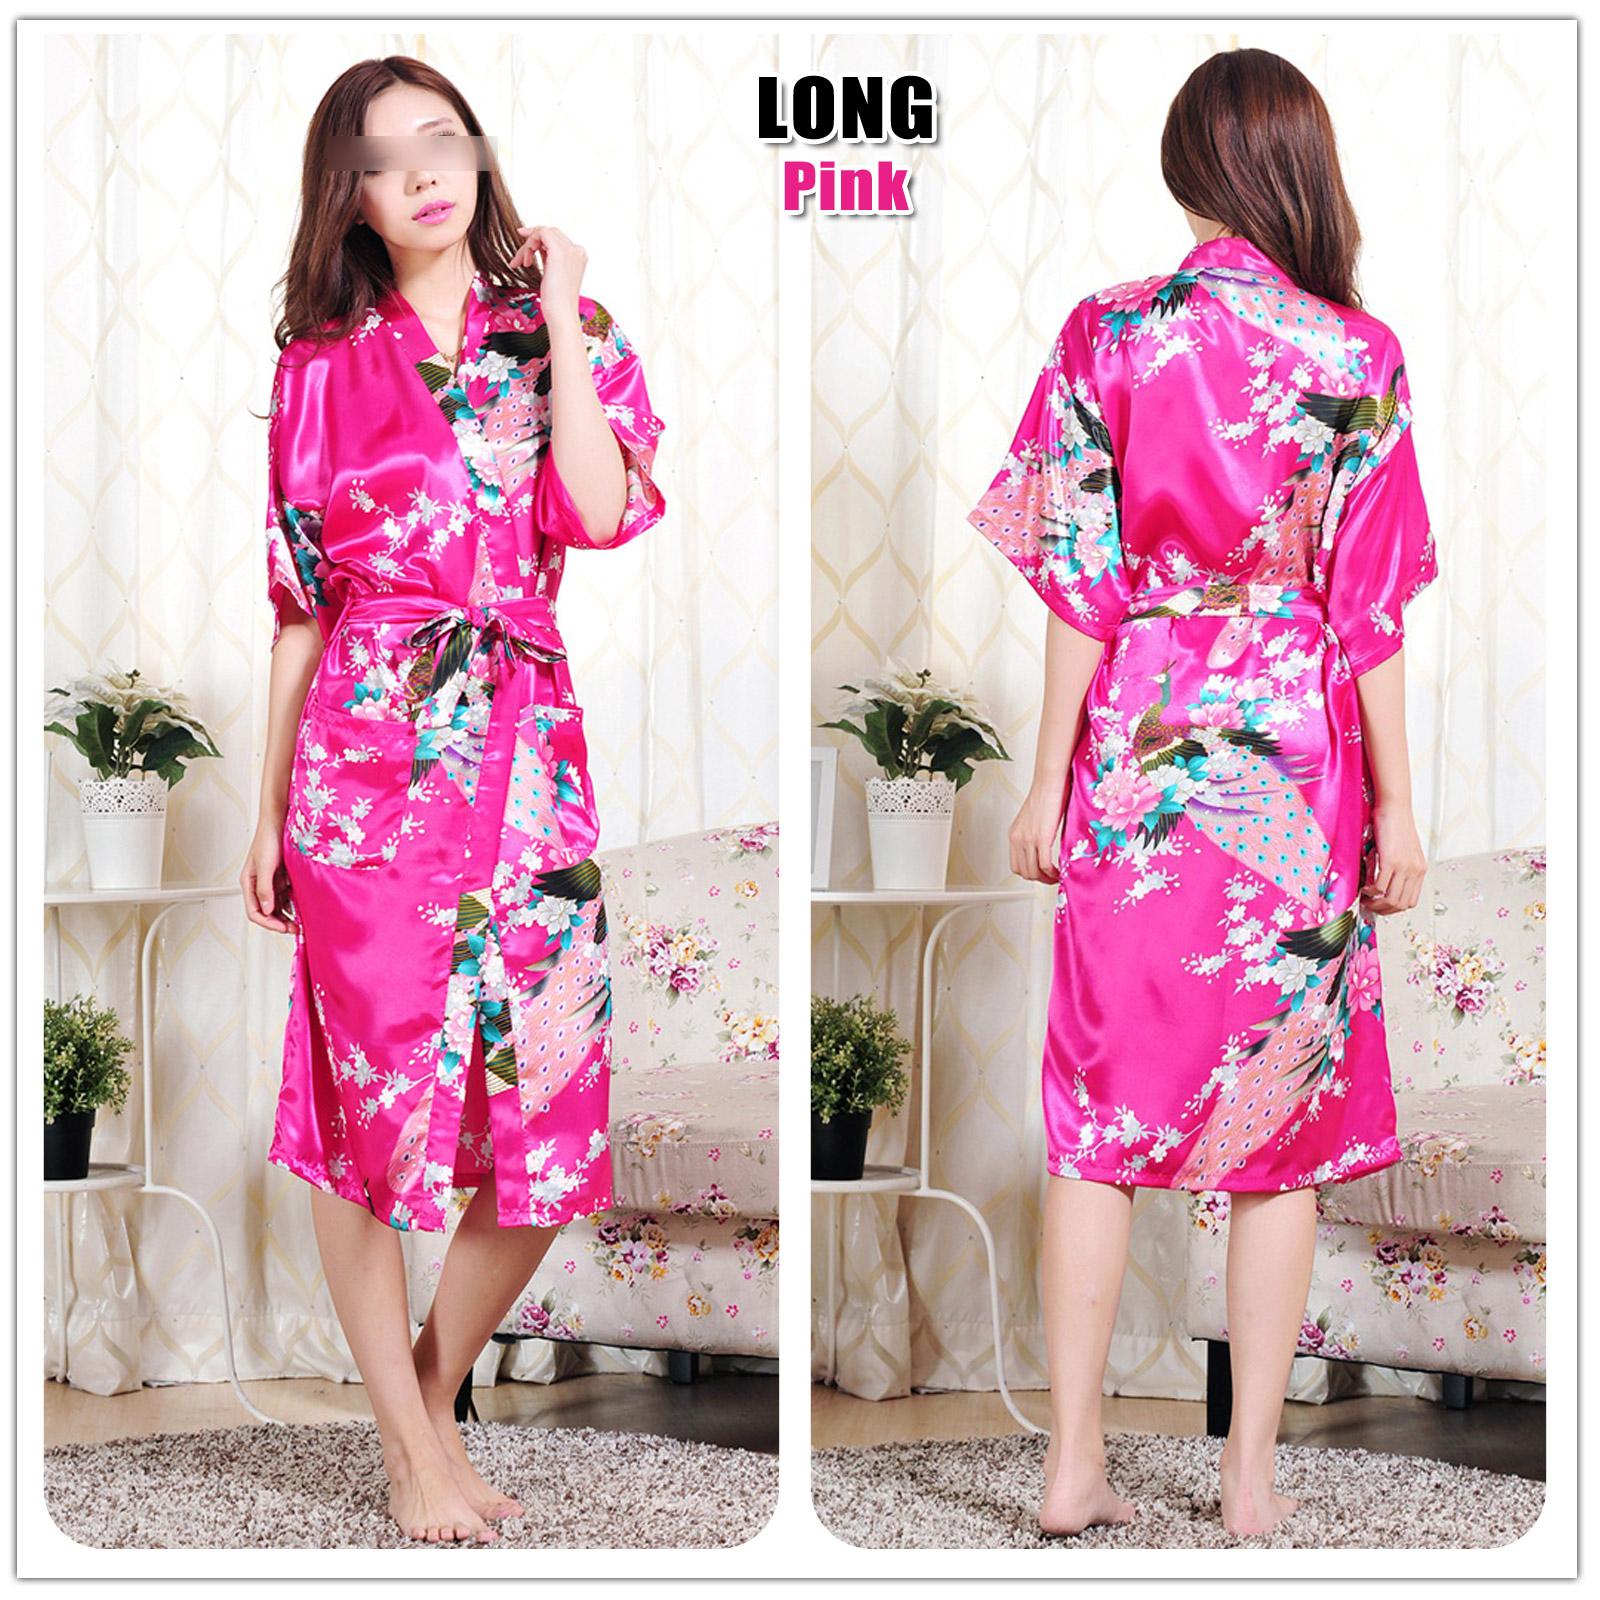 FLORAL SATIN ROBE Kimono Dressing Gown Sleepwear Wedding Bride ...